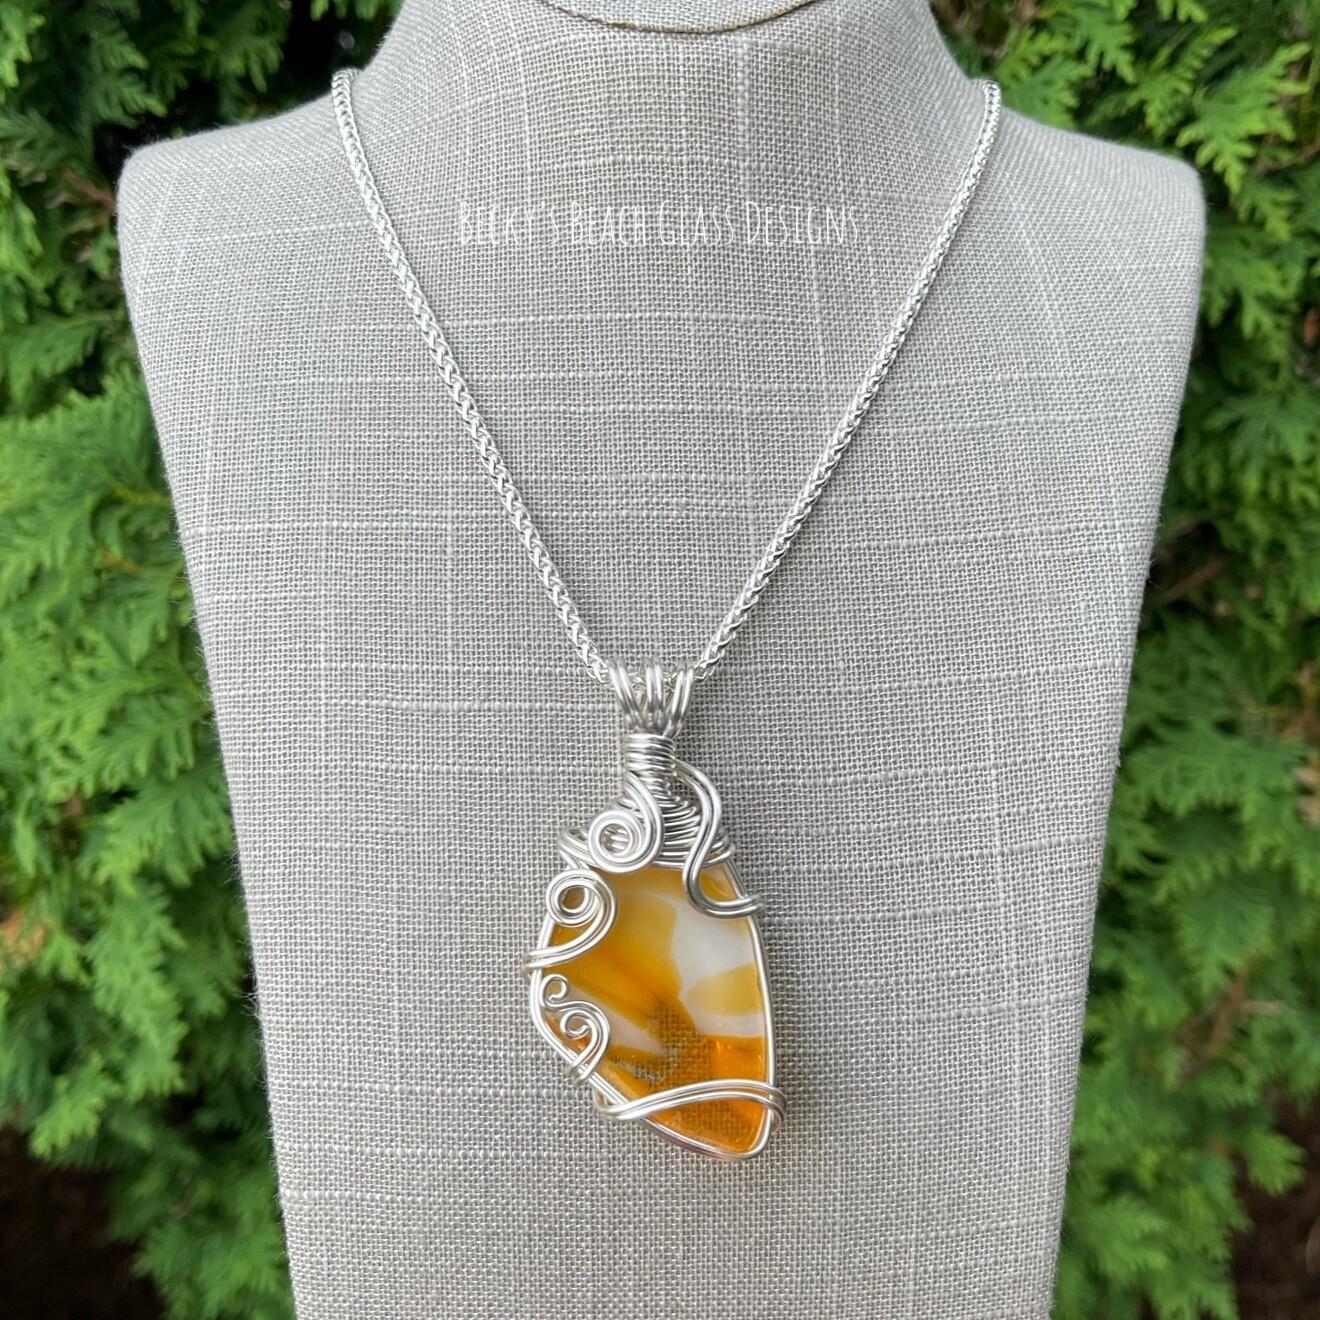 Orange and White Swirl English Art Glass Necklace